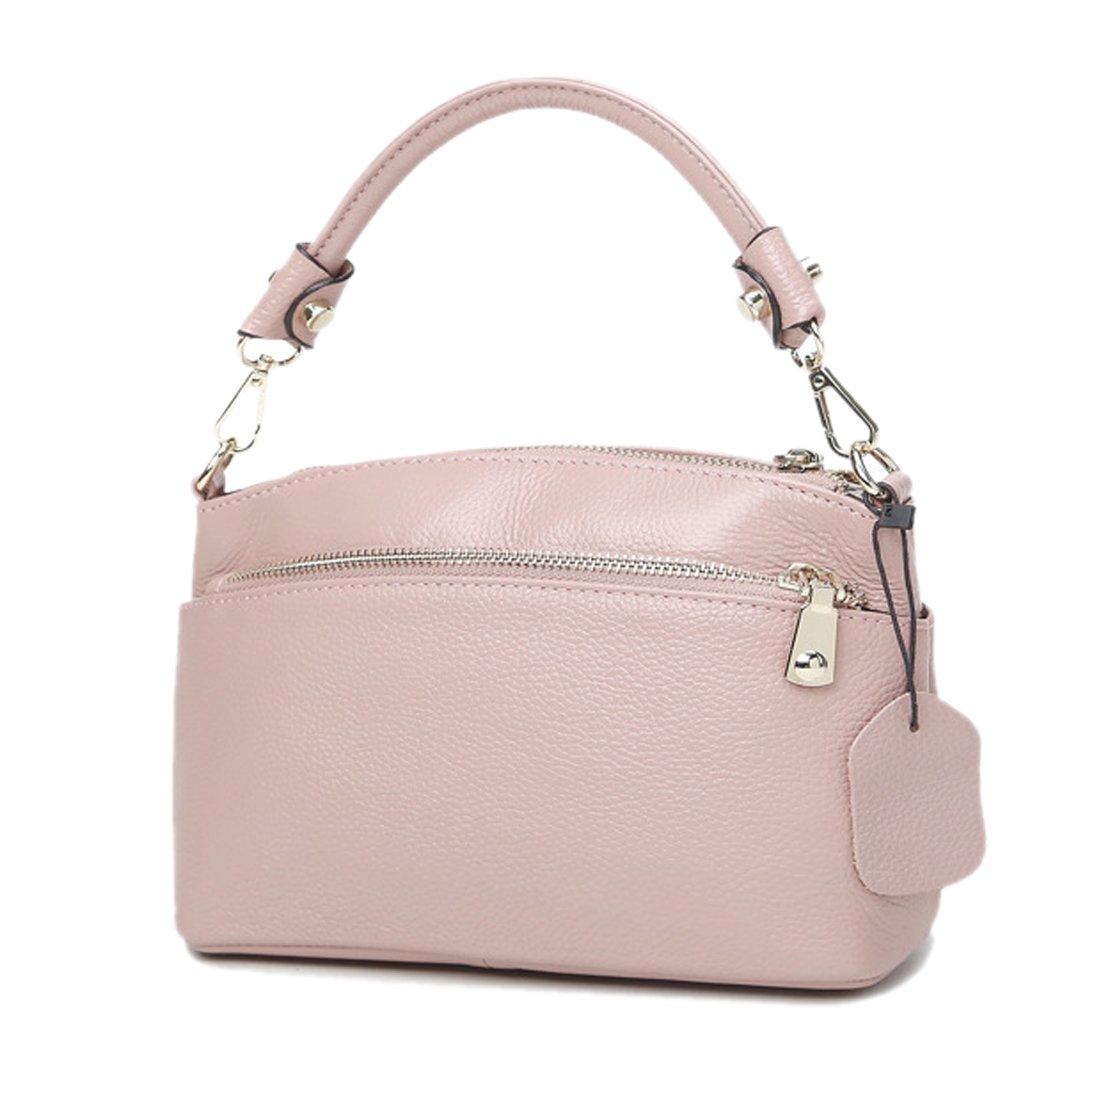 Artwell Women Genuine Leather Clutch Small Crossbody Shoulder Bag Ladies Small Handbag Satchel Phone Wallet Purse (Pink)